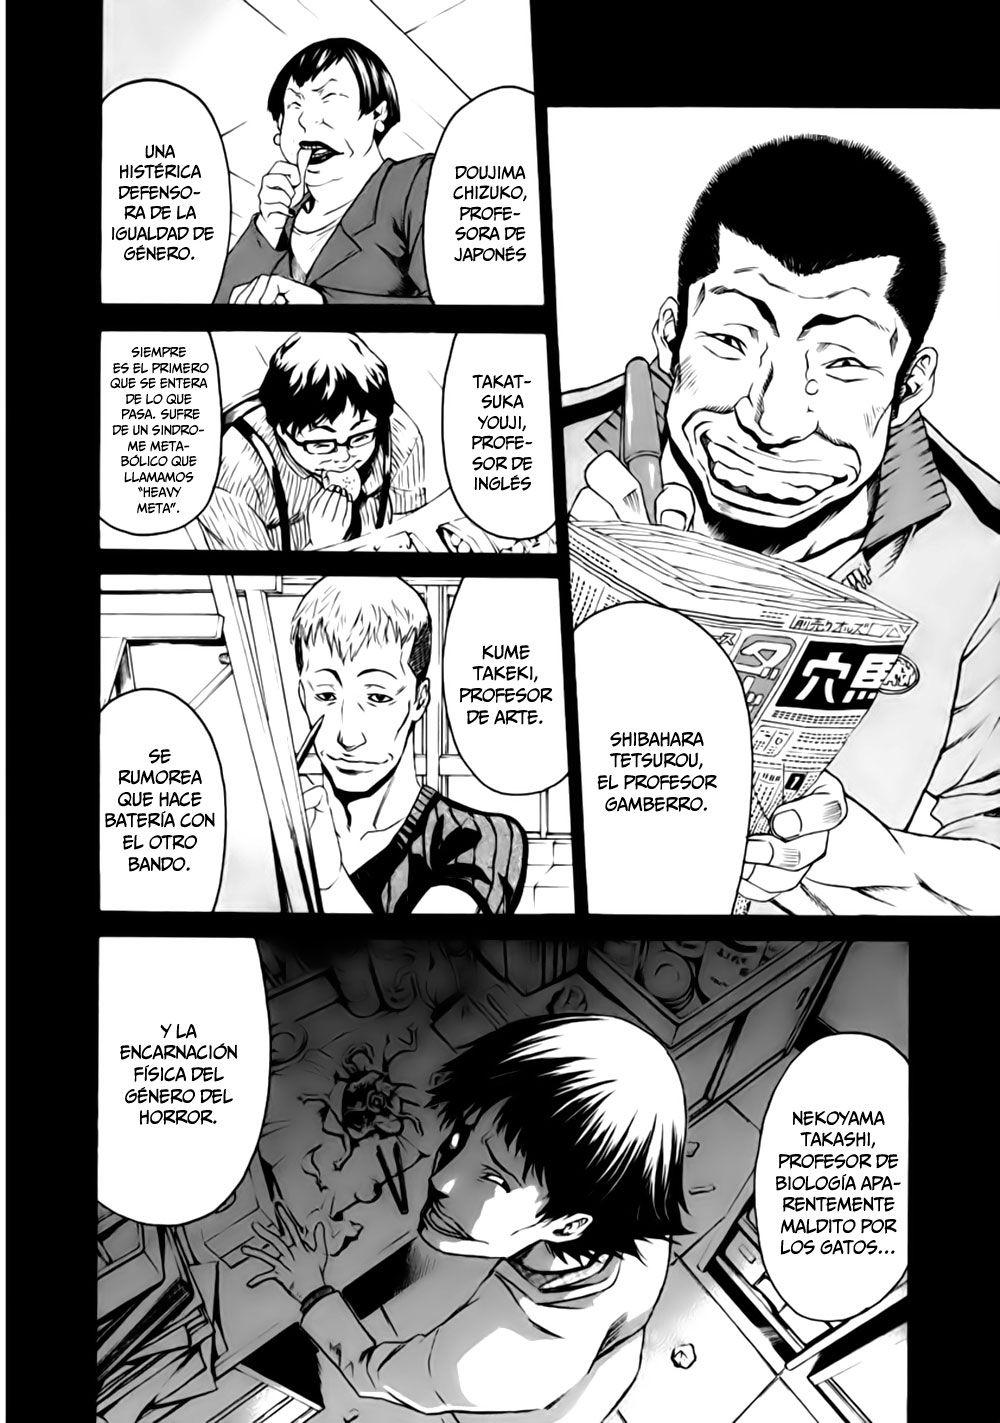 http://c5.ninemanga.com/es_manga/3/19523/460595/be9187009af326c03a72fd26f467f09c.jpg Page 15